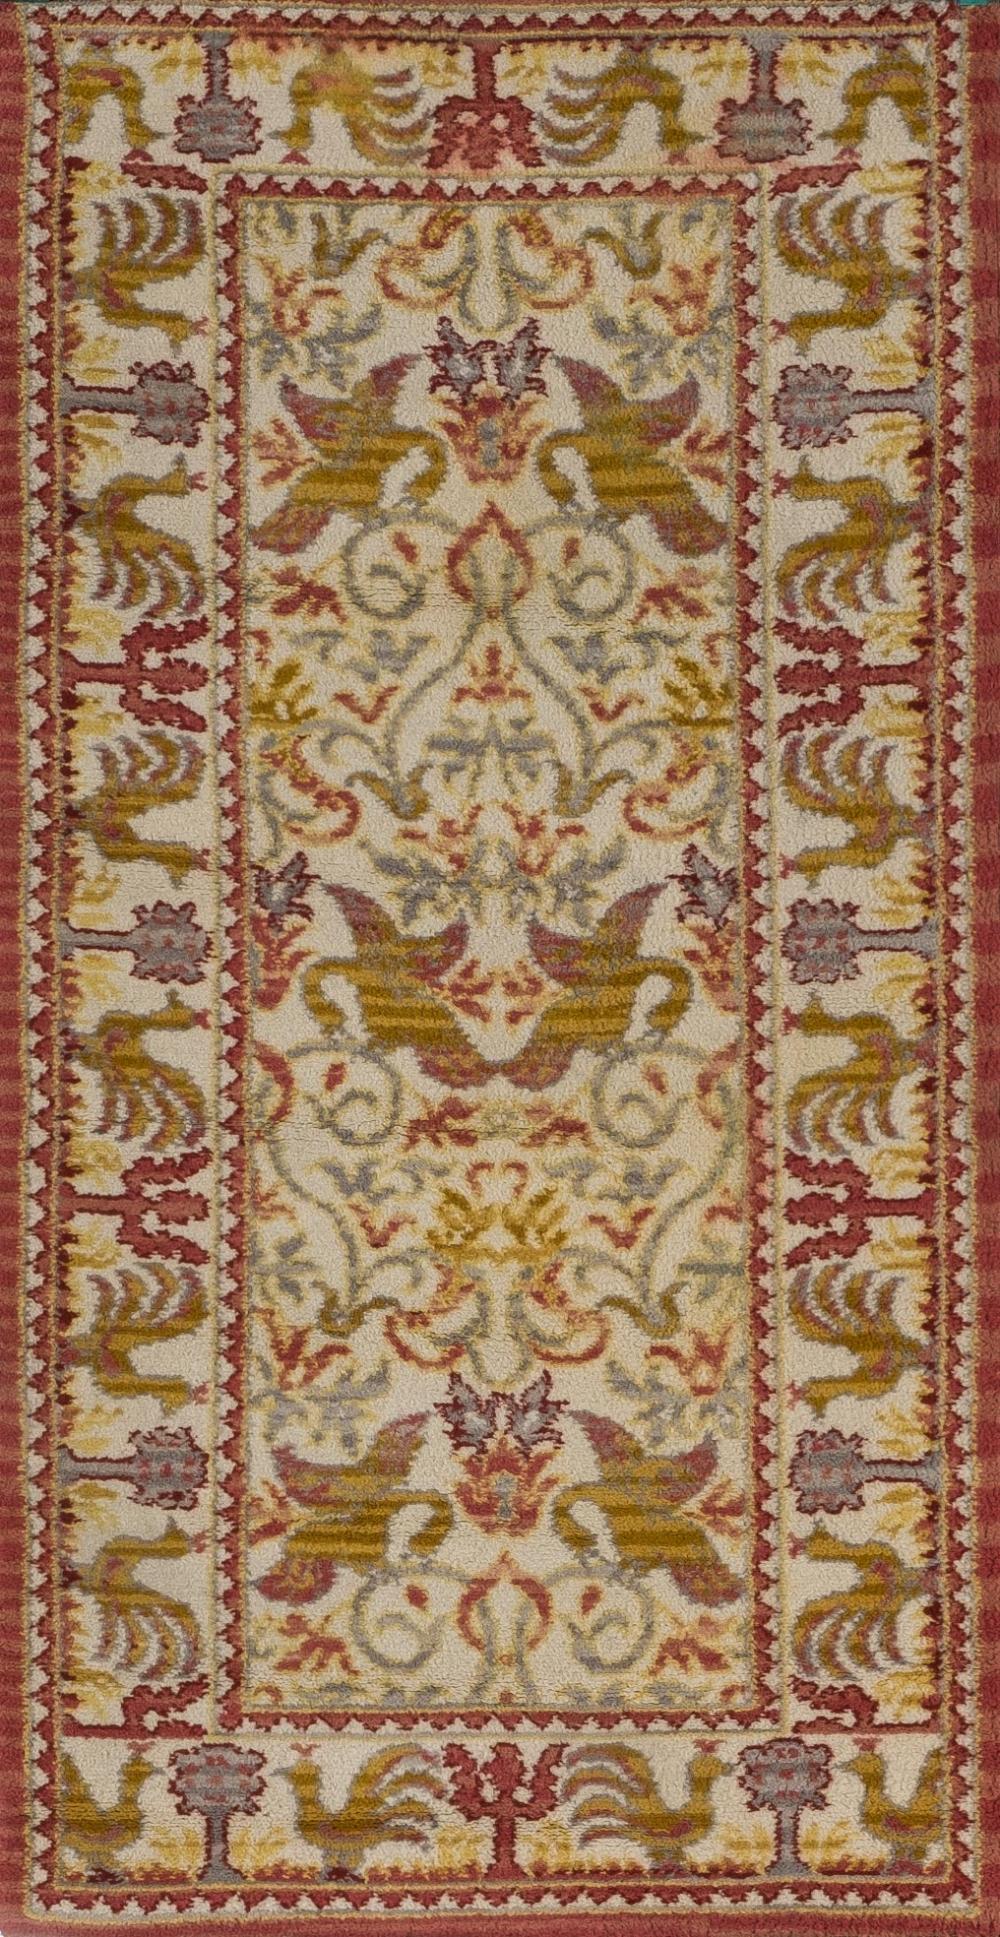 A Spanish wool carpet. 20th C